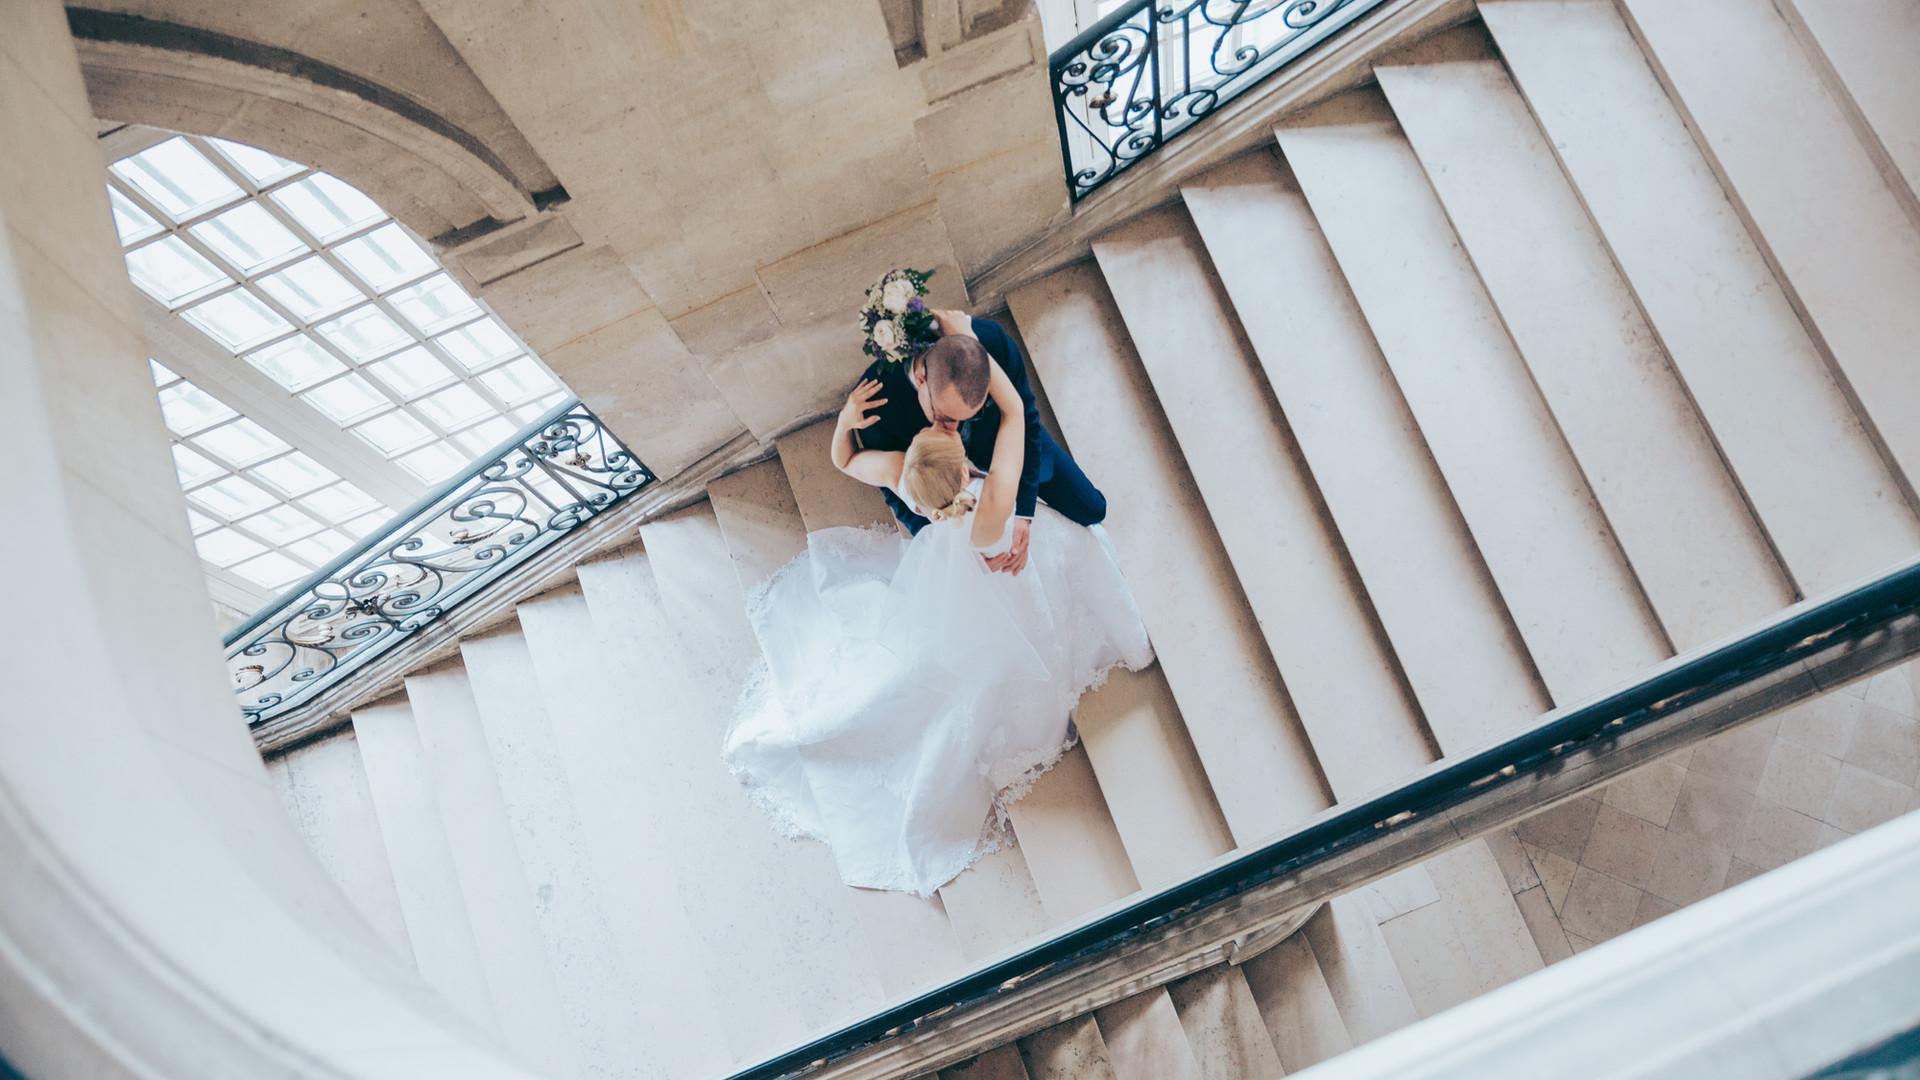 Wedding photographer rouen normandie France